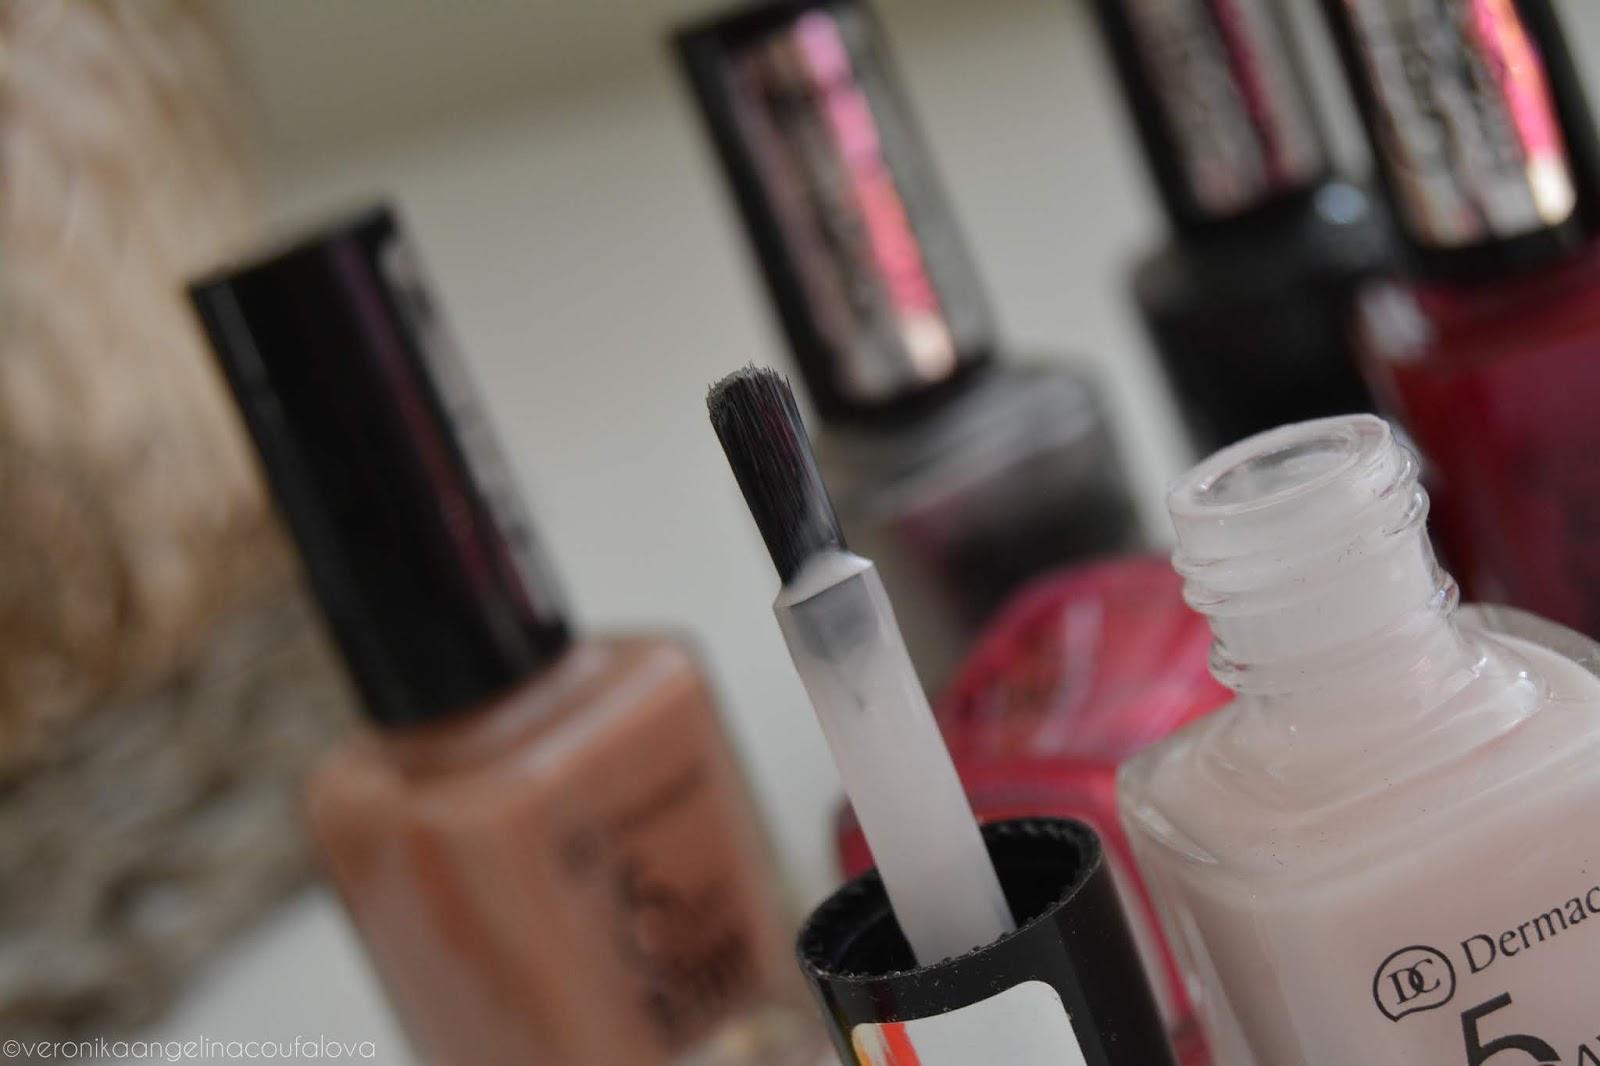 Angelina Beauty Blogger Dermacol 5 Day Stay Dlouhotrvajici Laky Na Nehty Mini Summer Collection Letni Laky Na Nehty